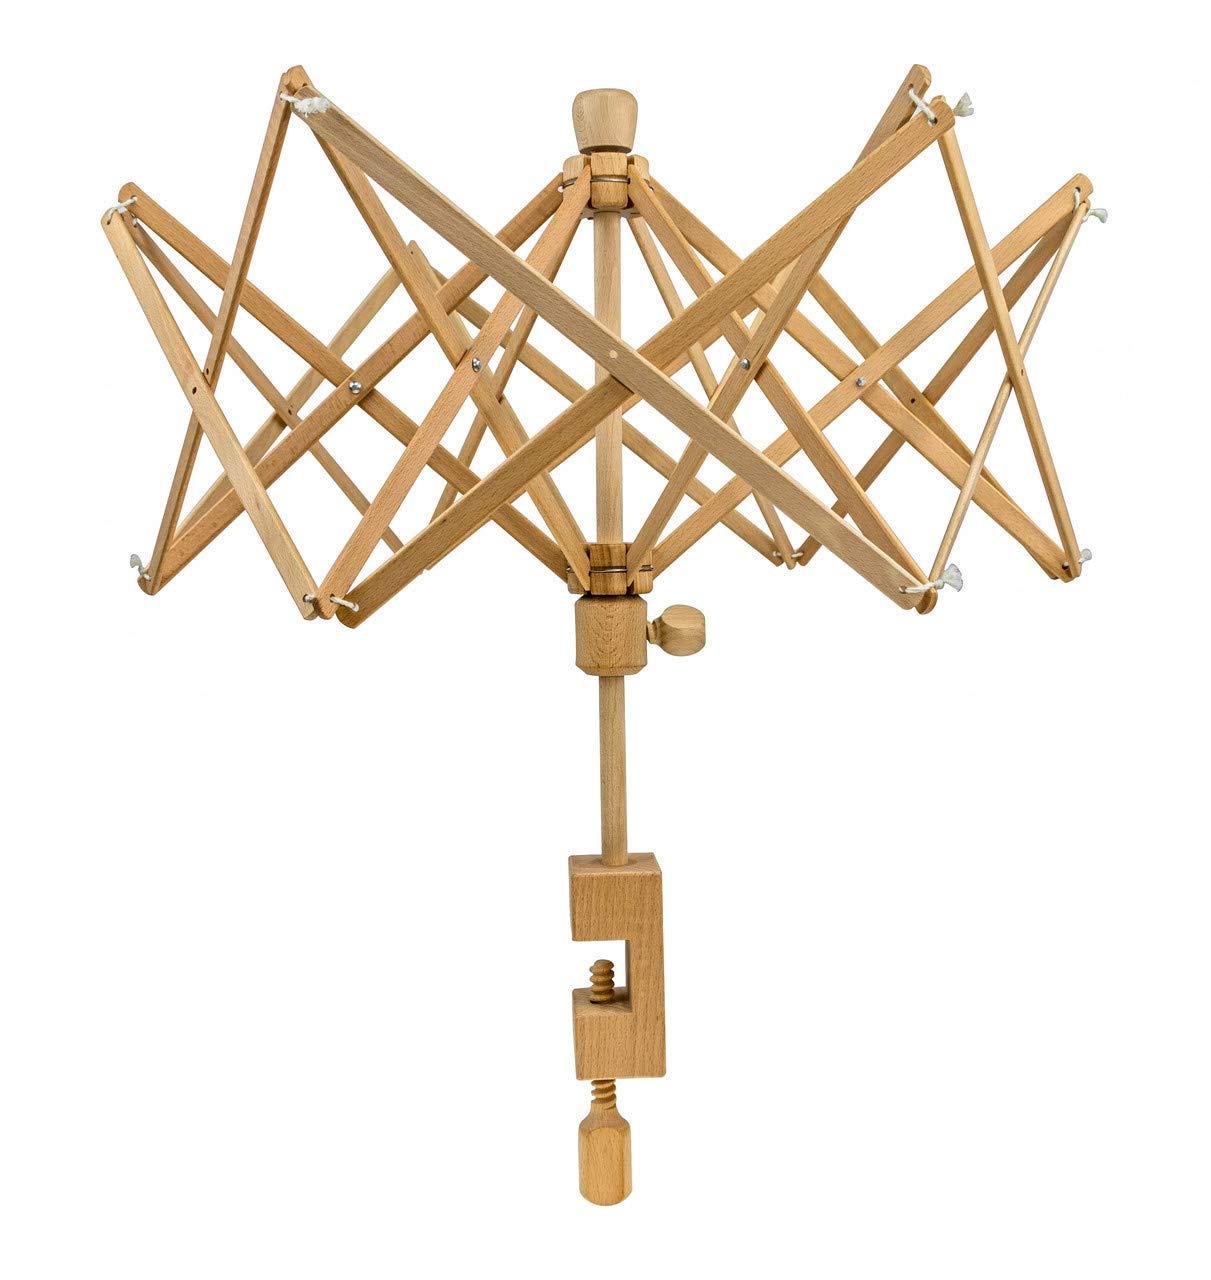 Stanwood Needlecraft Wooden Umbrella Swift Yarn Winder, Medium (Renewed)